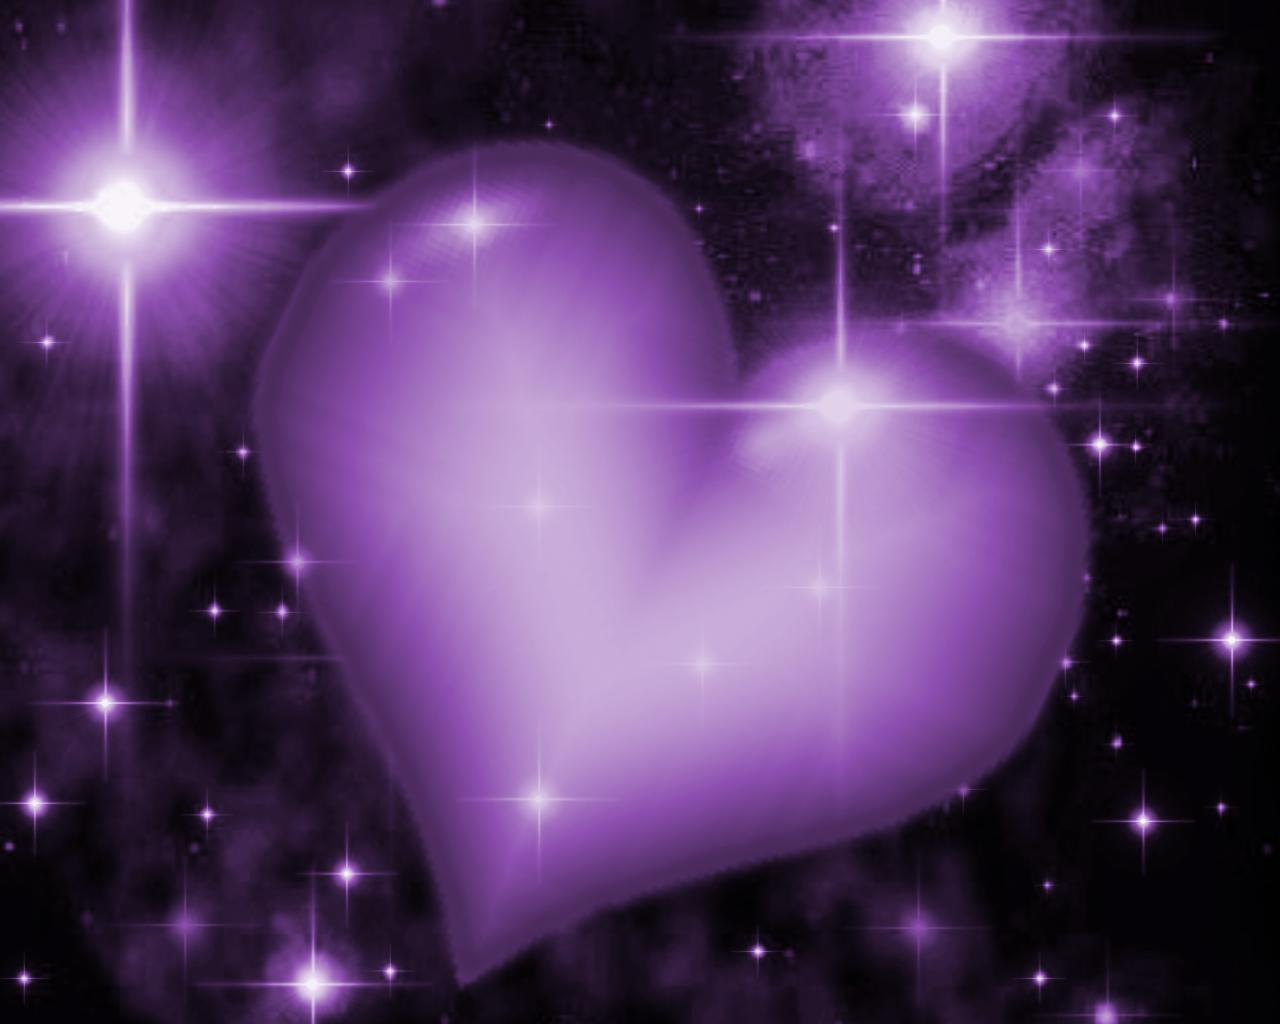 Banilung purple wallpaper designs 1280x1024